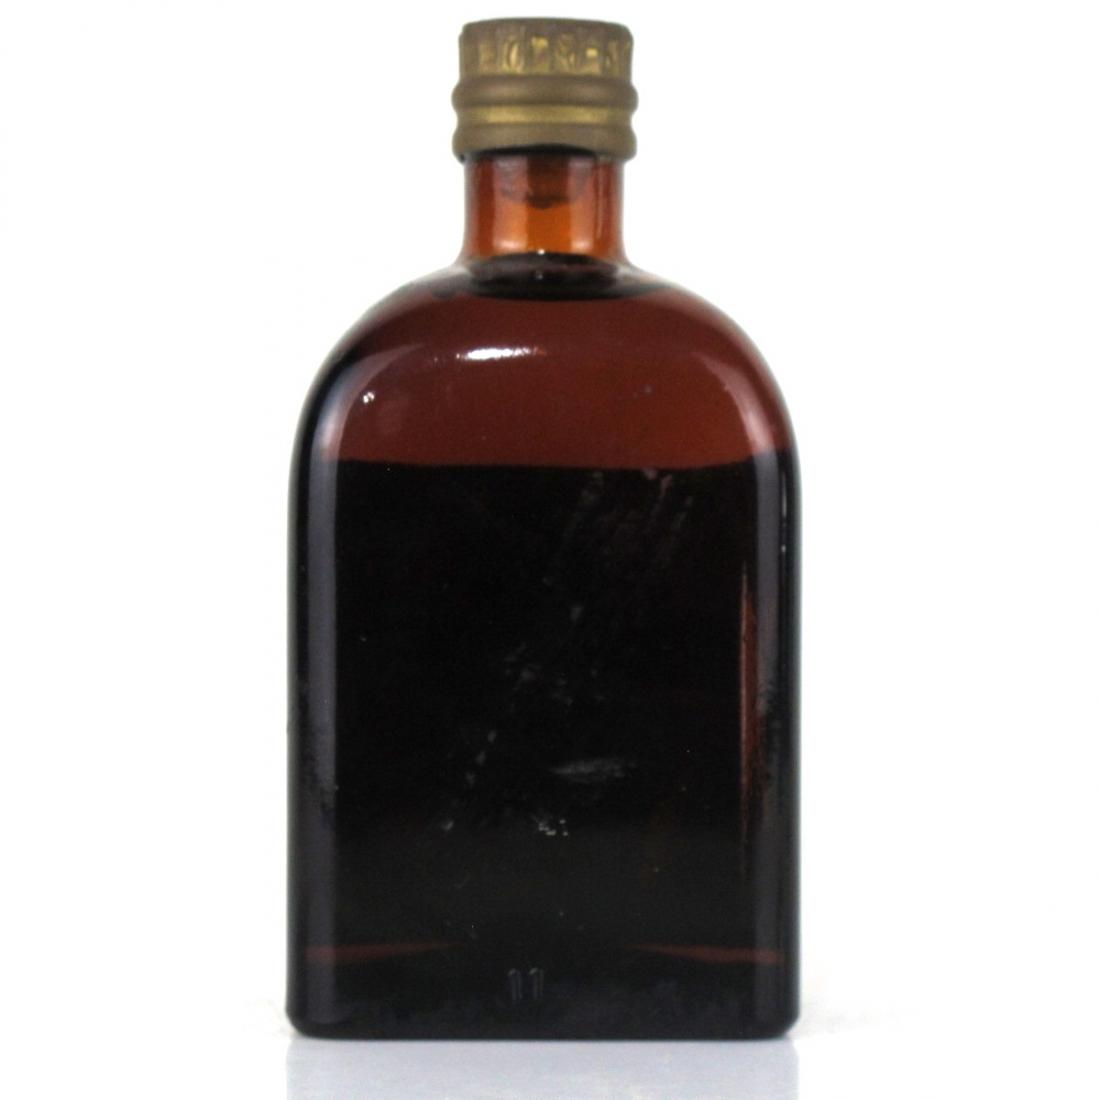 Paul Schrader Jamaika Rum 35cl 1960s